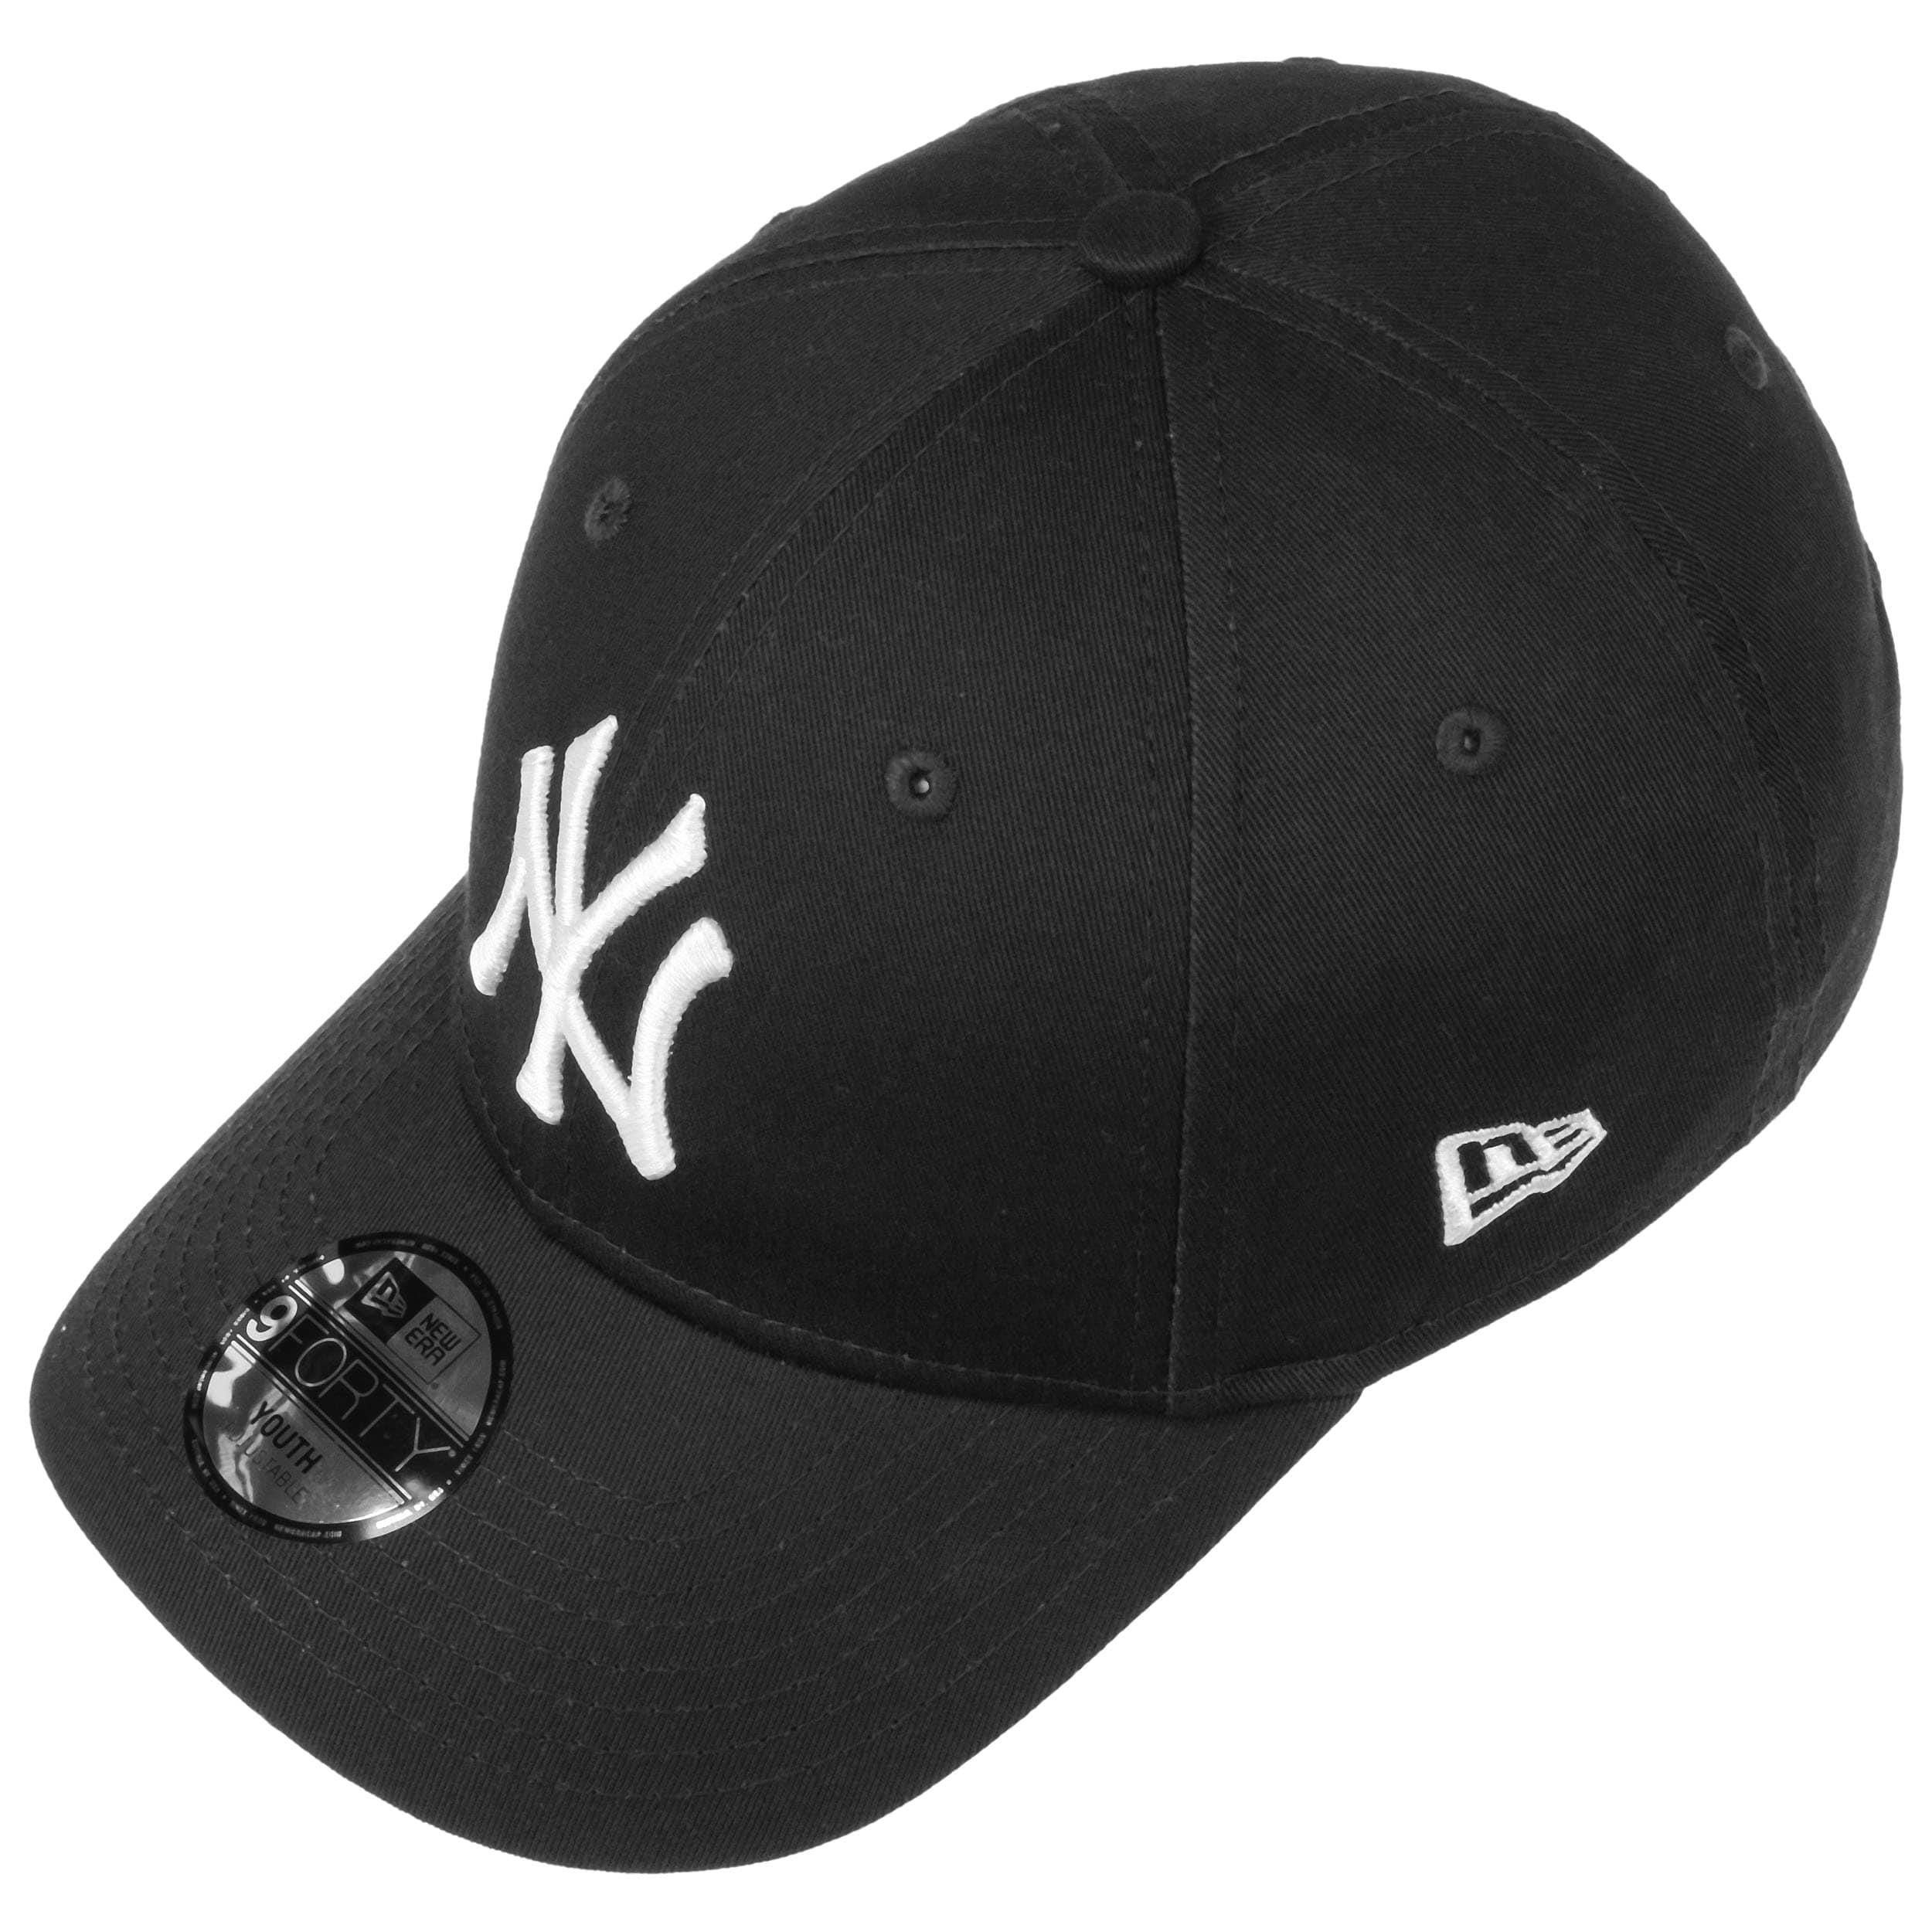 298912e6f292a ... 9Forty JUNIOR NY Yankees Cap by New Era - black-white 1 ...